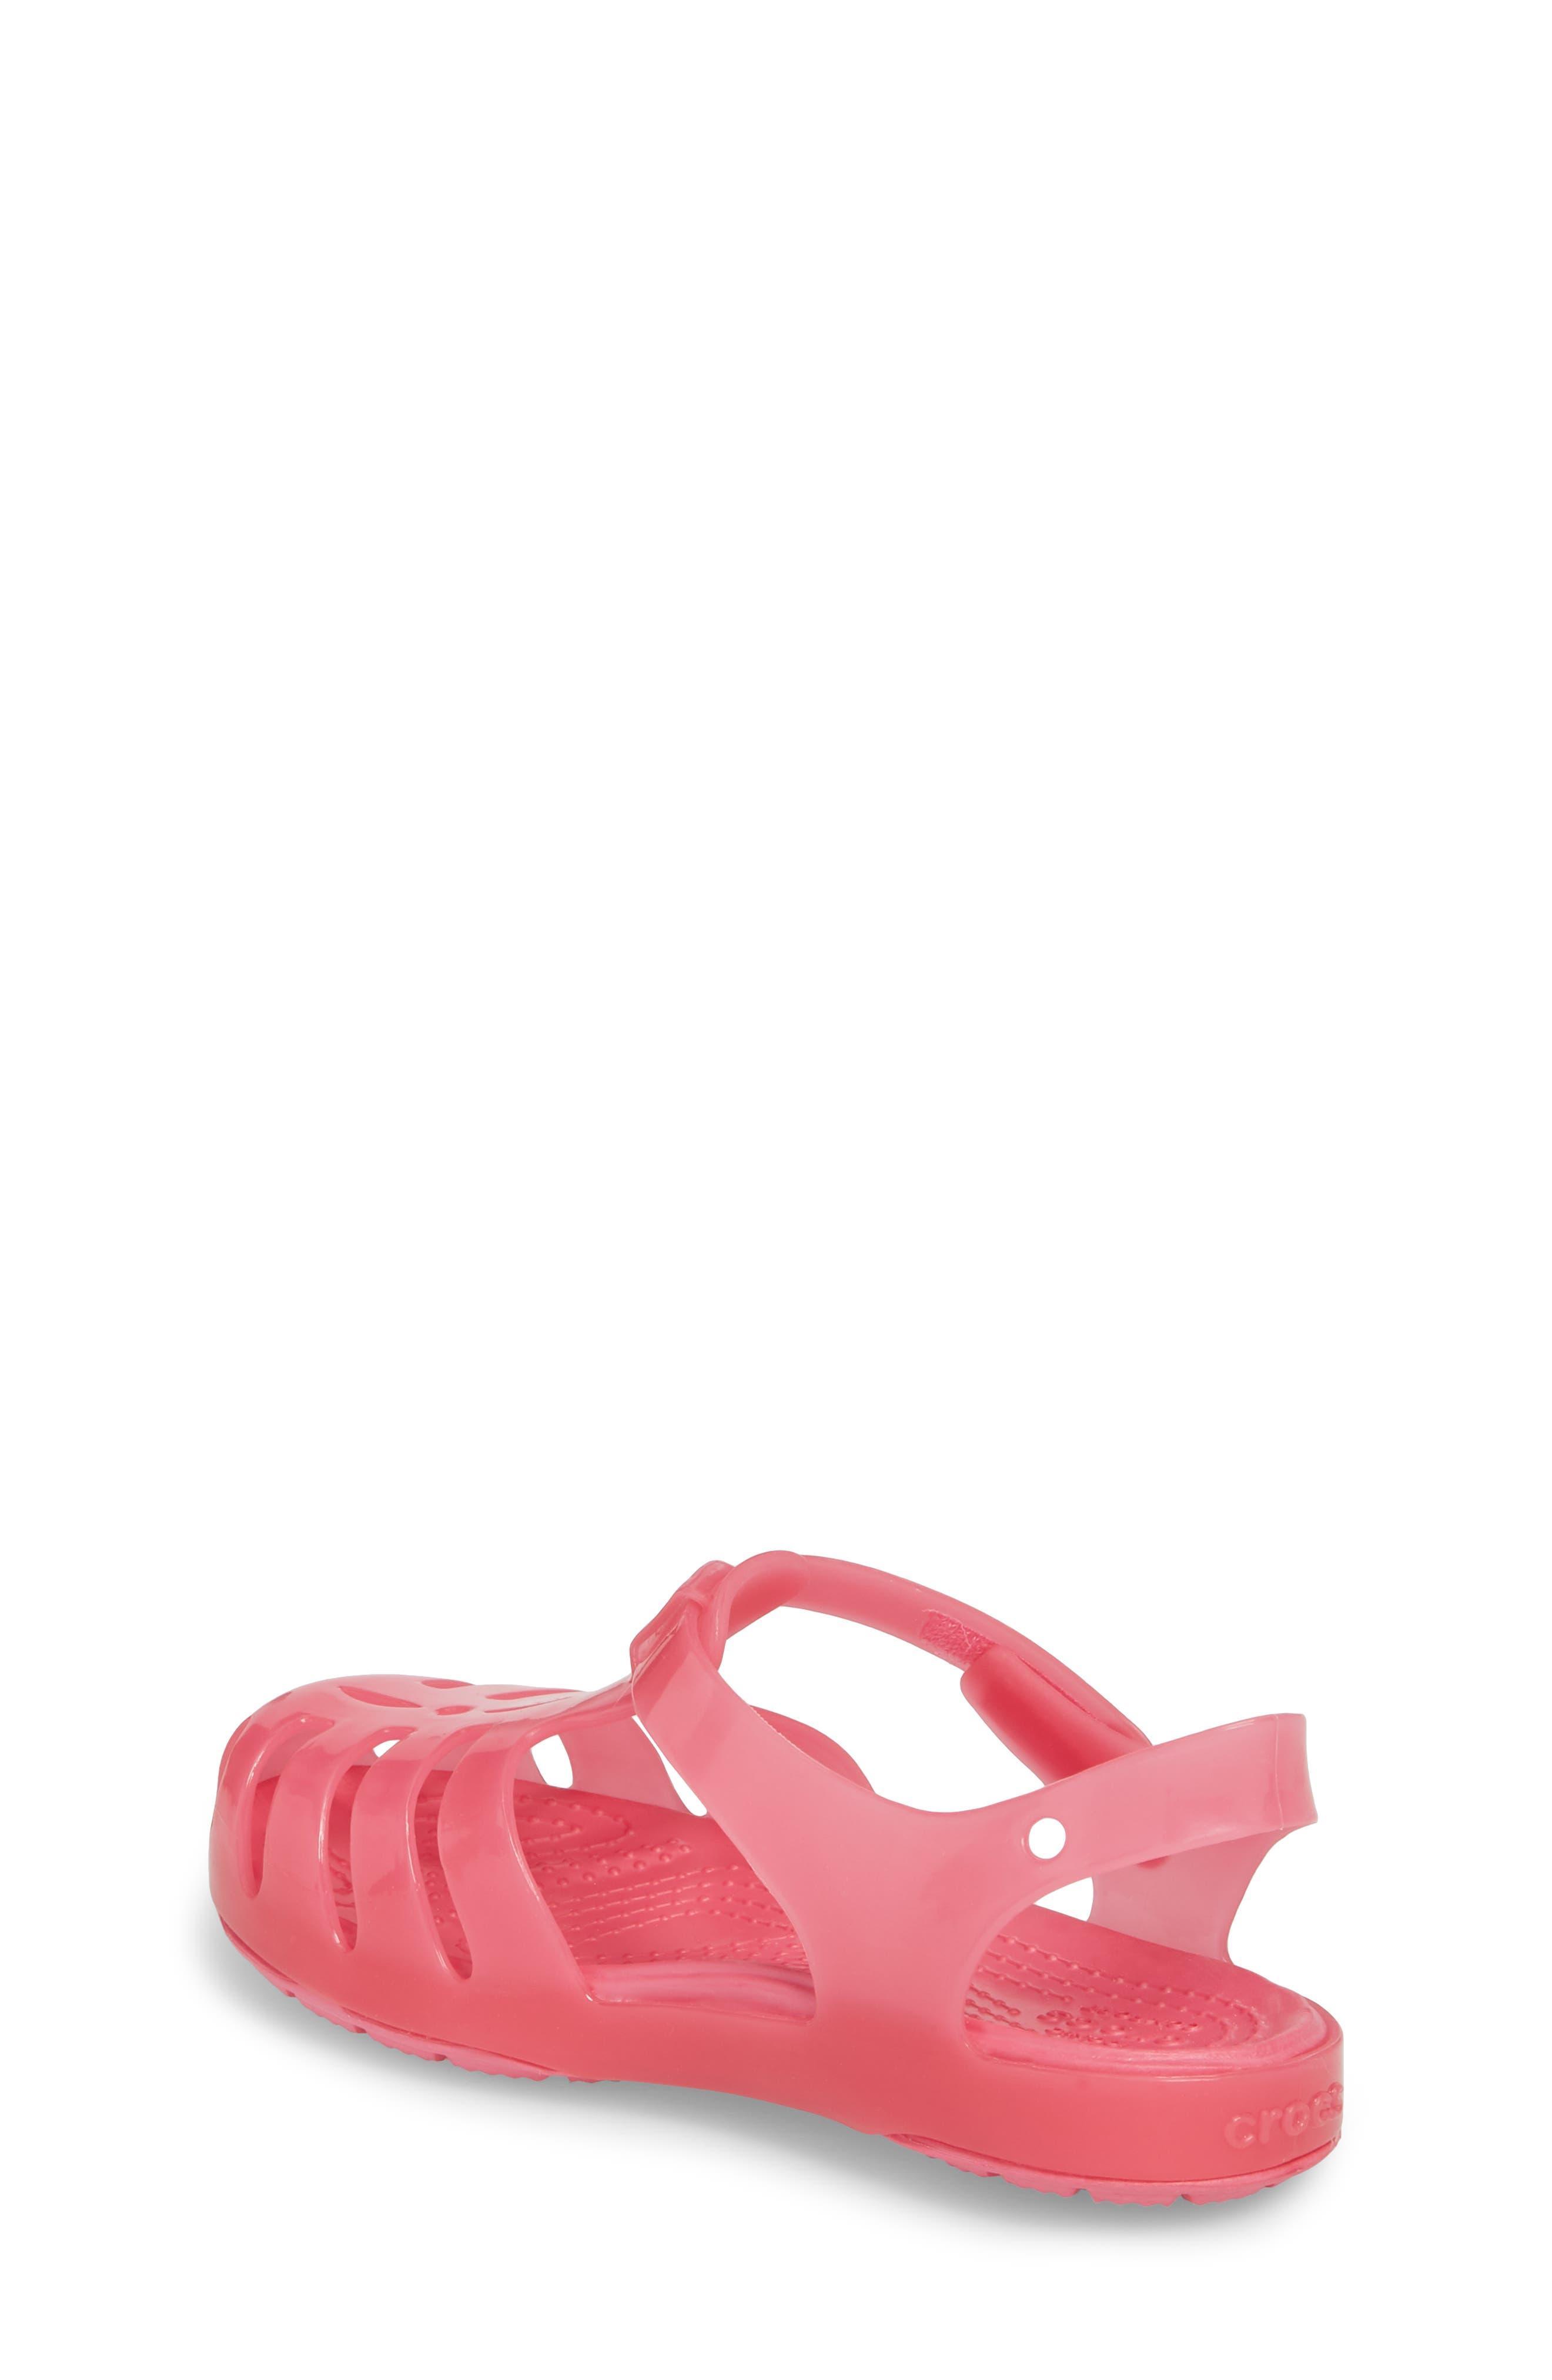 Isabella Glitter Fisherman Sandal,                             Alternate thumbnail 2, color,                             Paradise Pink